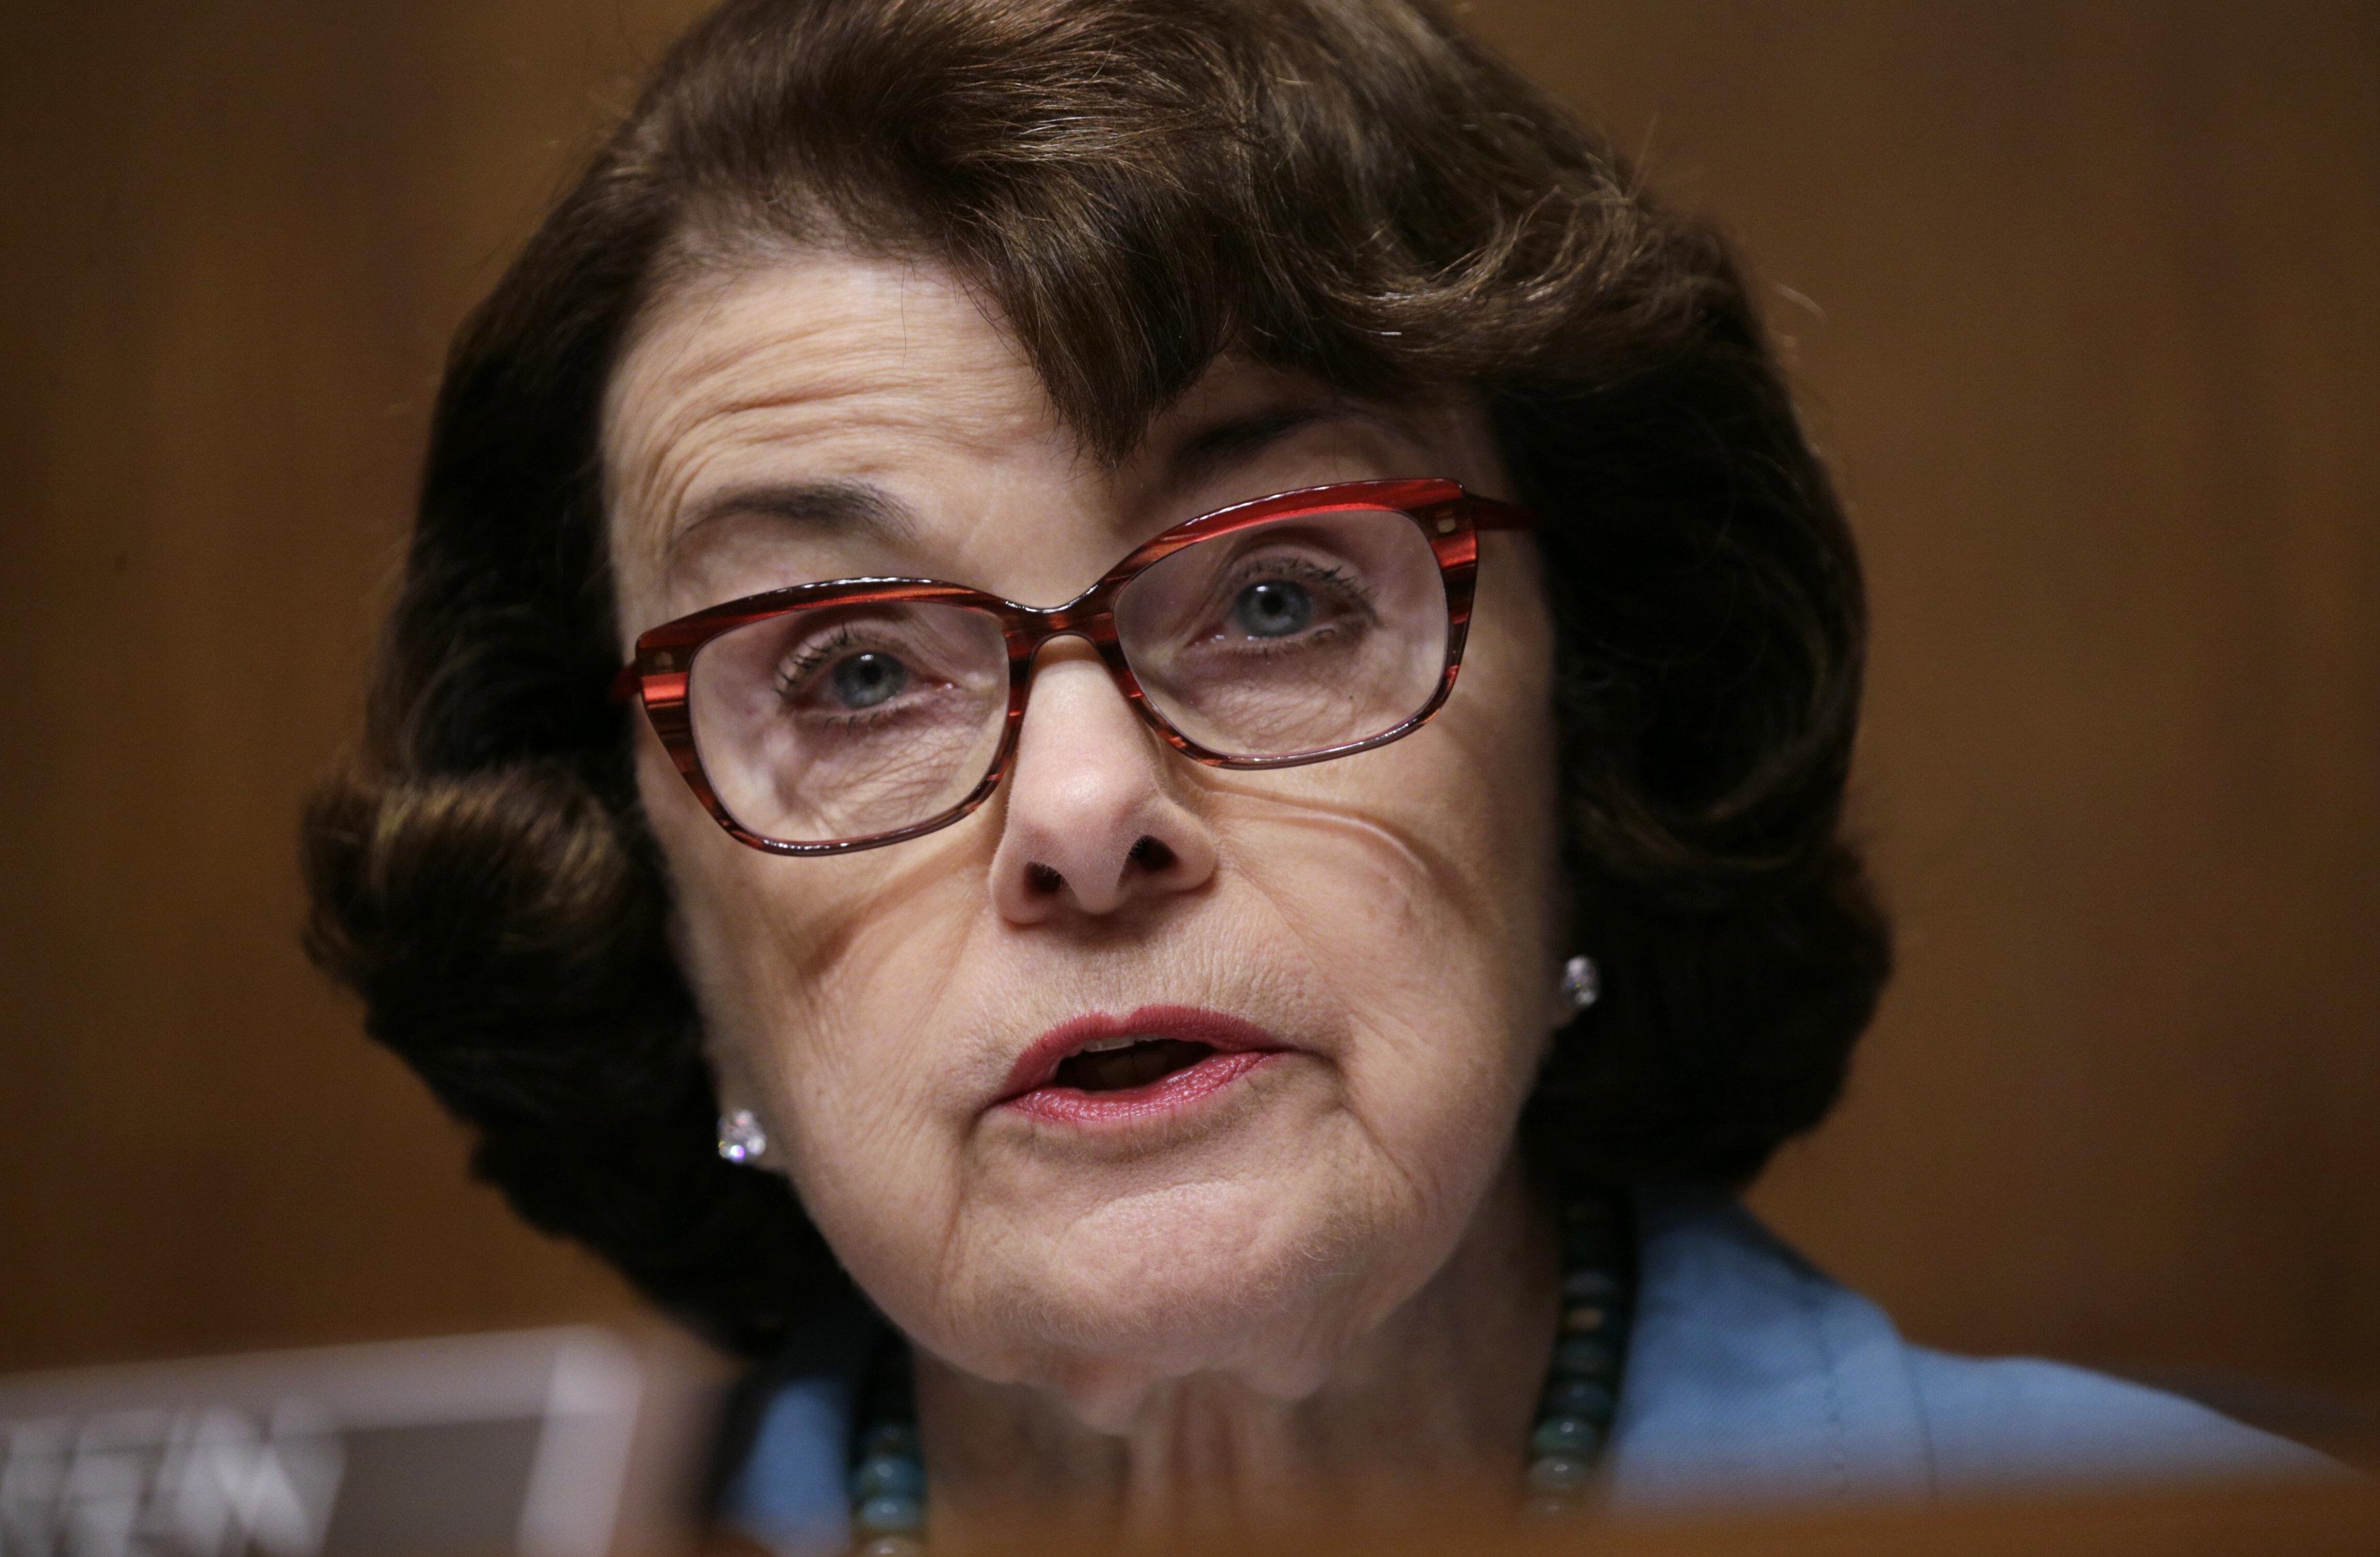 Dianne Goldman Berman Feinstein ˈ f aɪ n s t aɪ n born Dianne Emiel Goldman June 22 1933 is an American politician serving as the senior United States